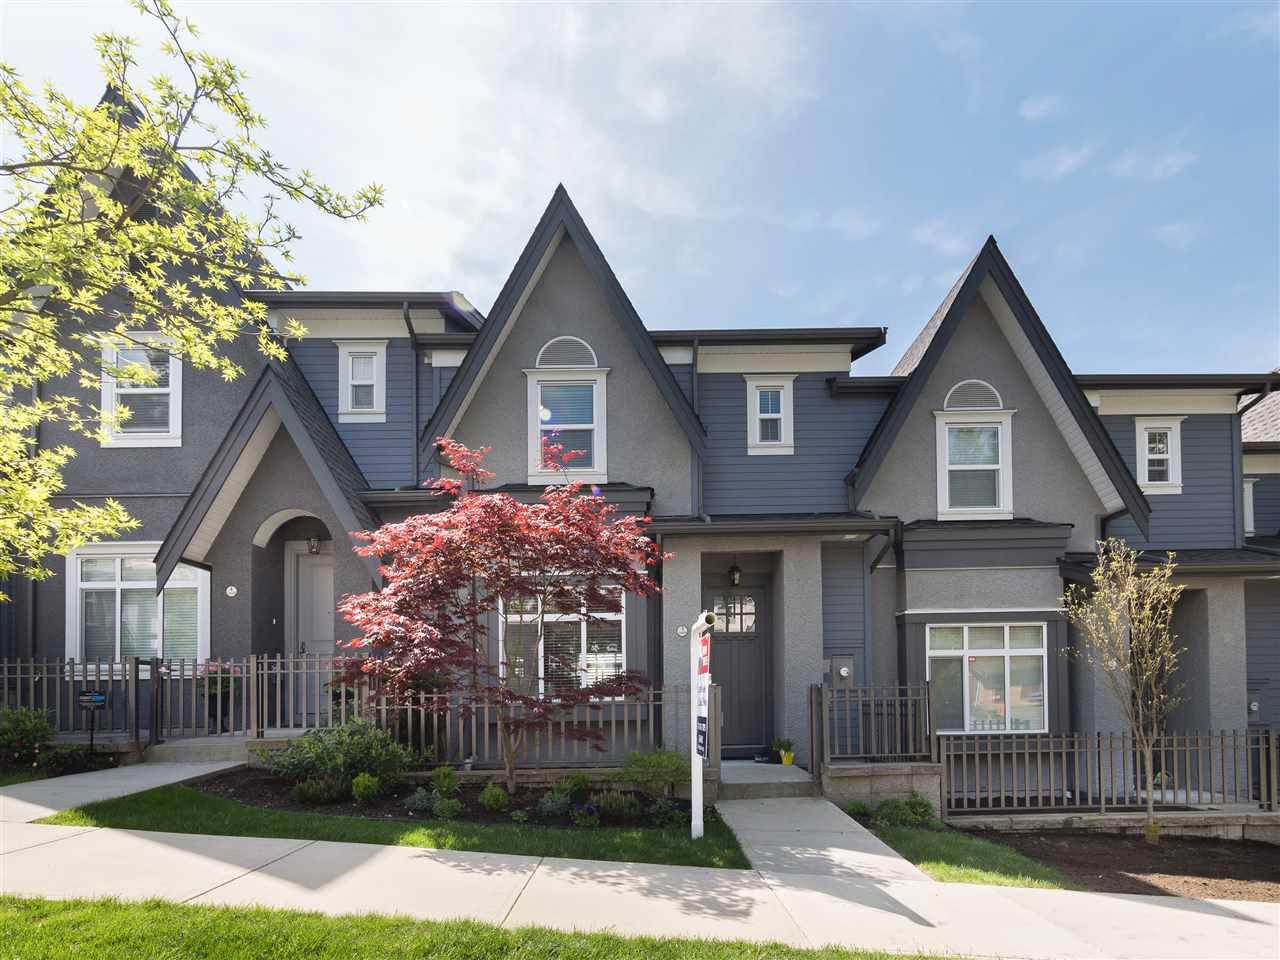 Main Photo: 3 3410 ROXTON Avenue in Coquitlam: Burke Mountain Condo for sale : MLS®# R2263698